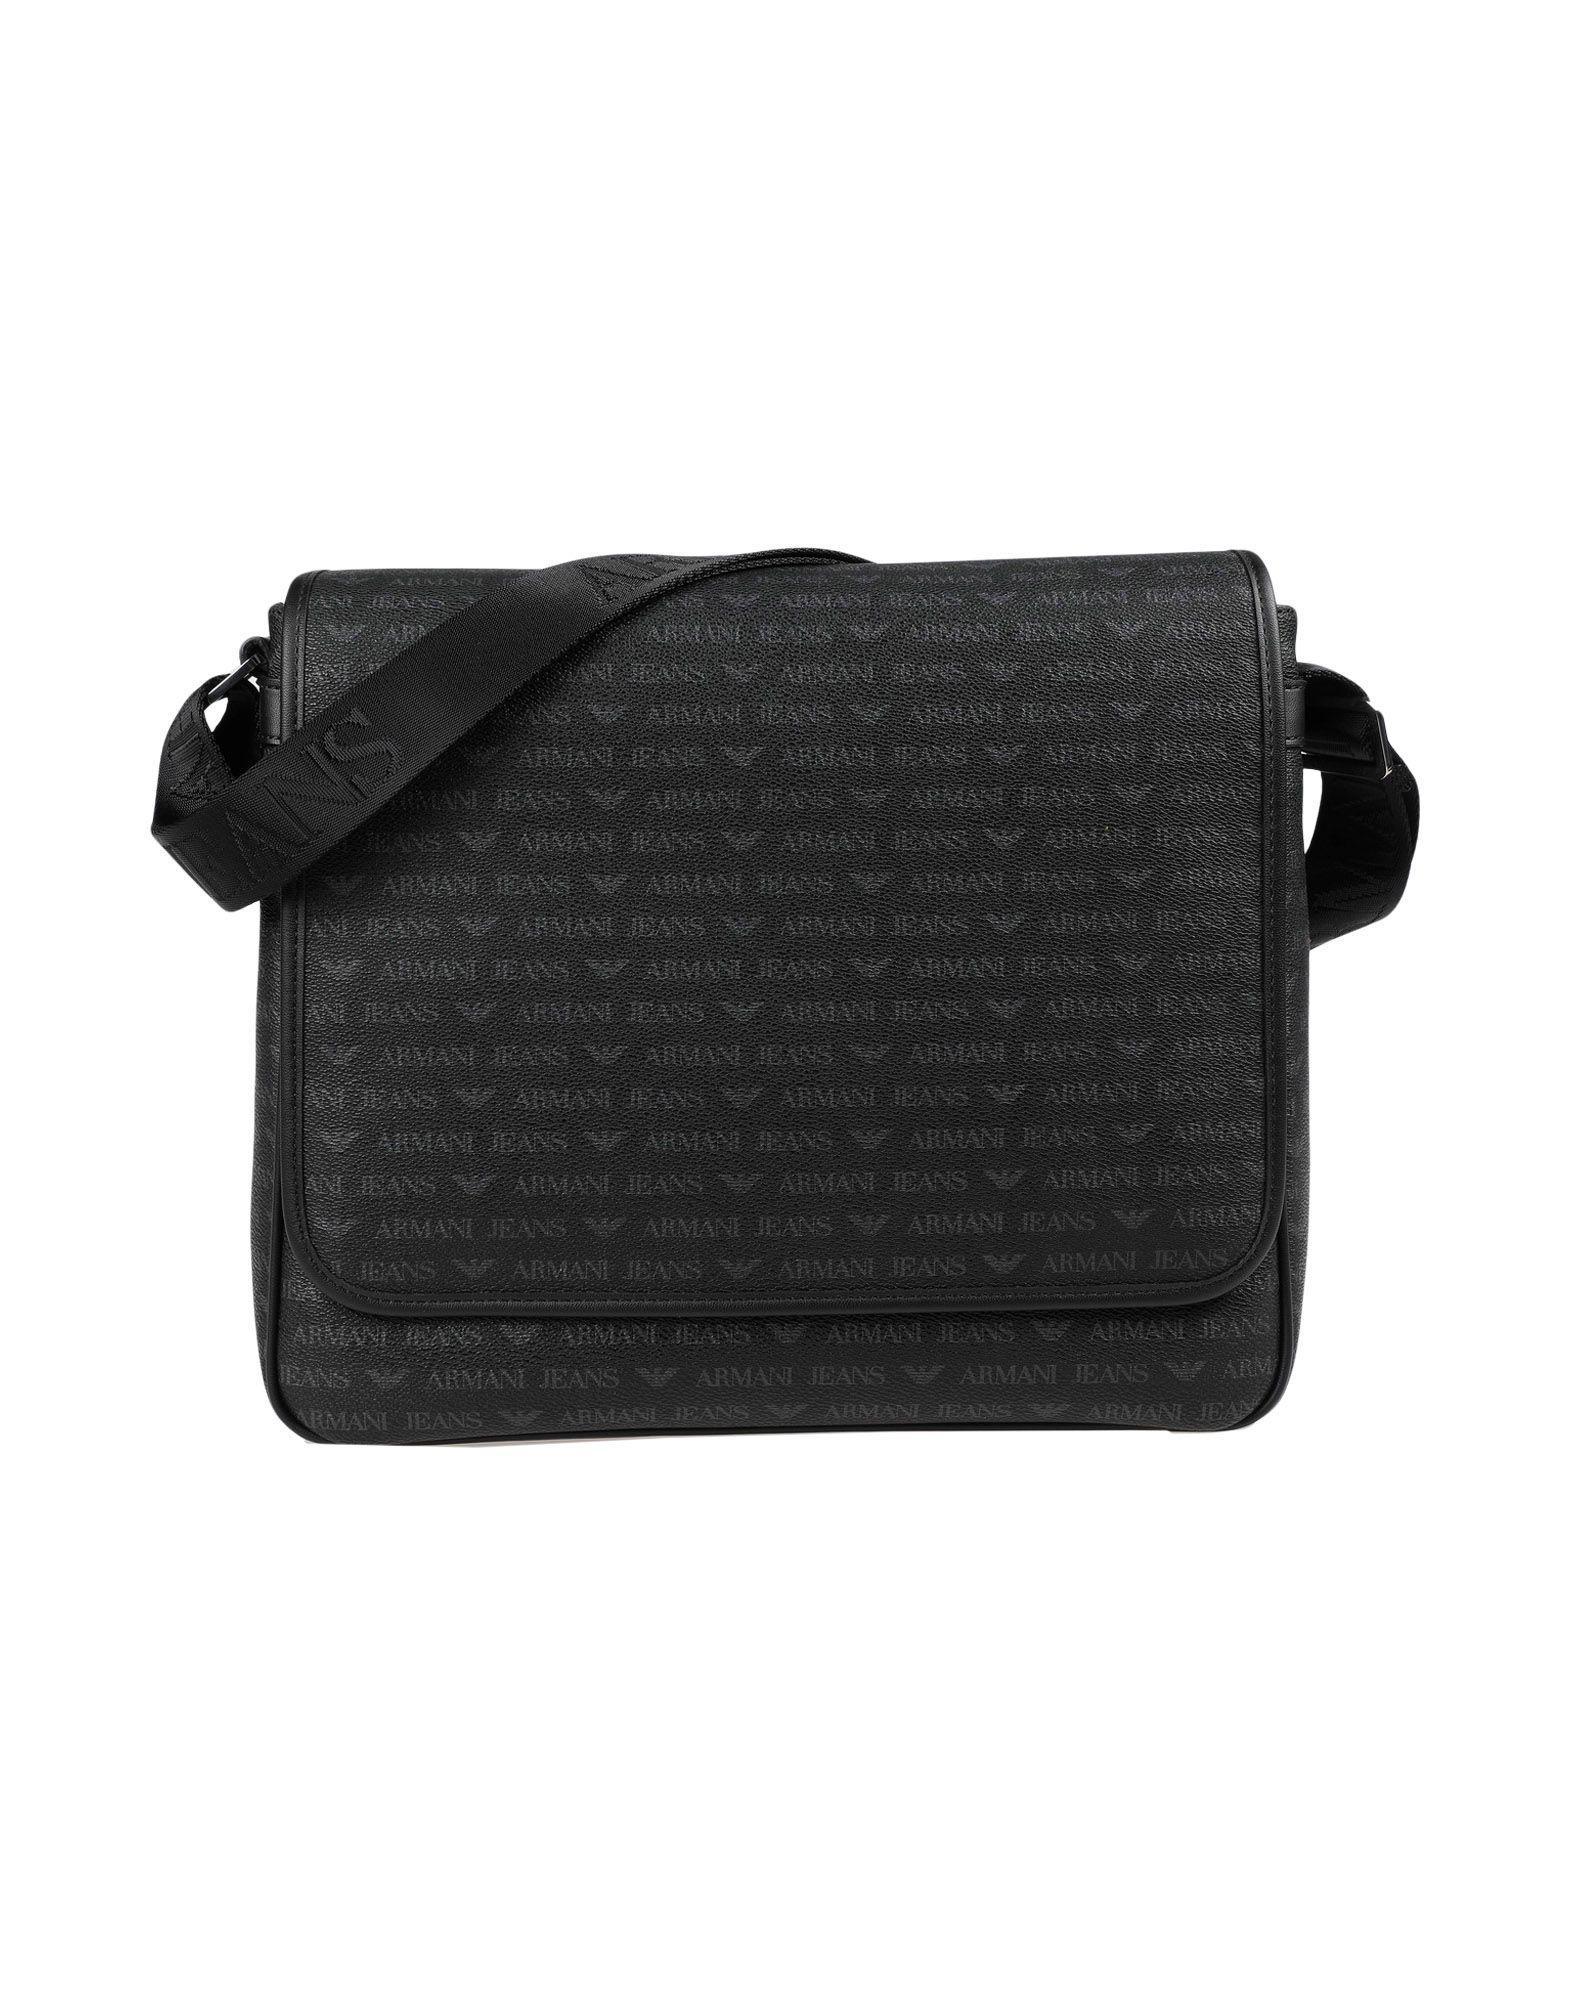 Armani Jeans Work Bags In Black